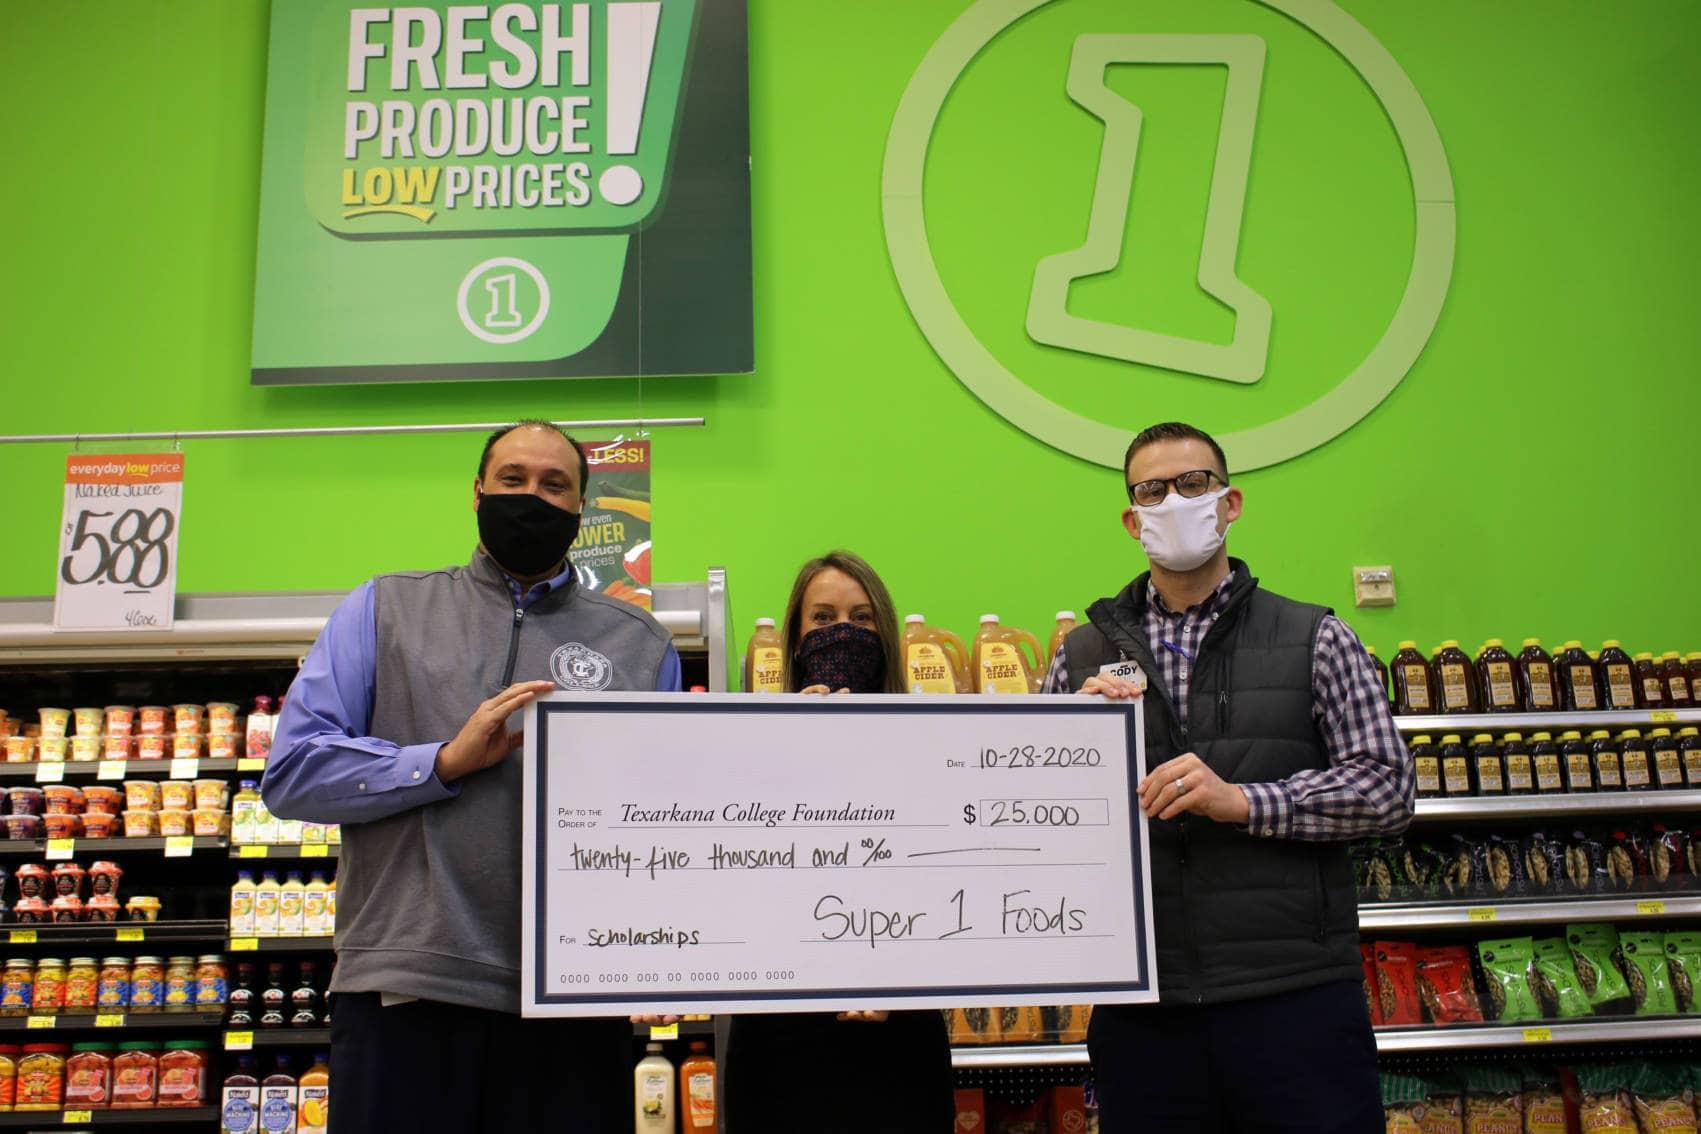 Super 1 Foods endowment donation